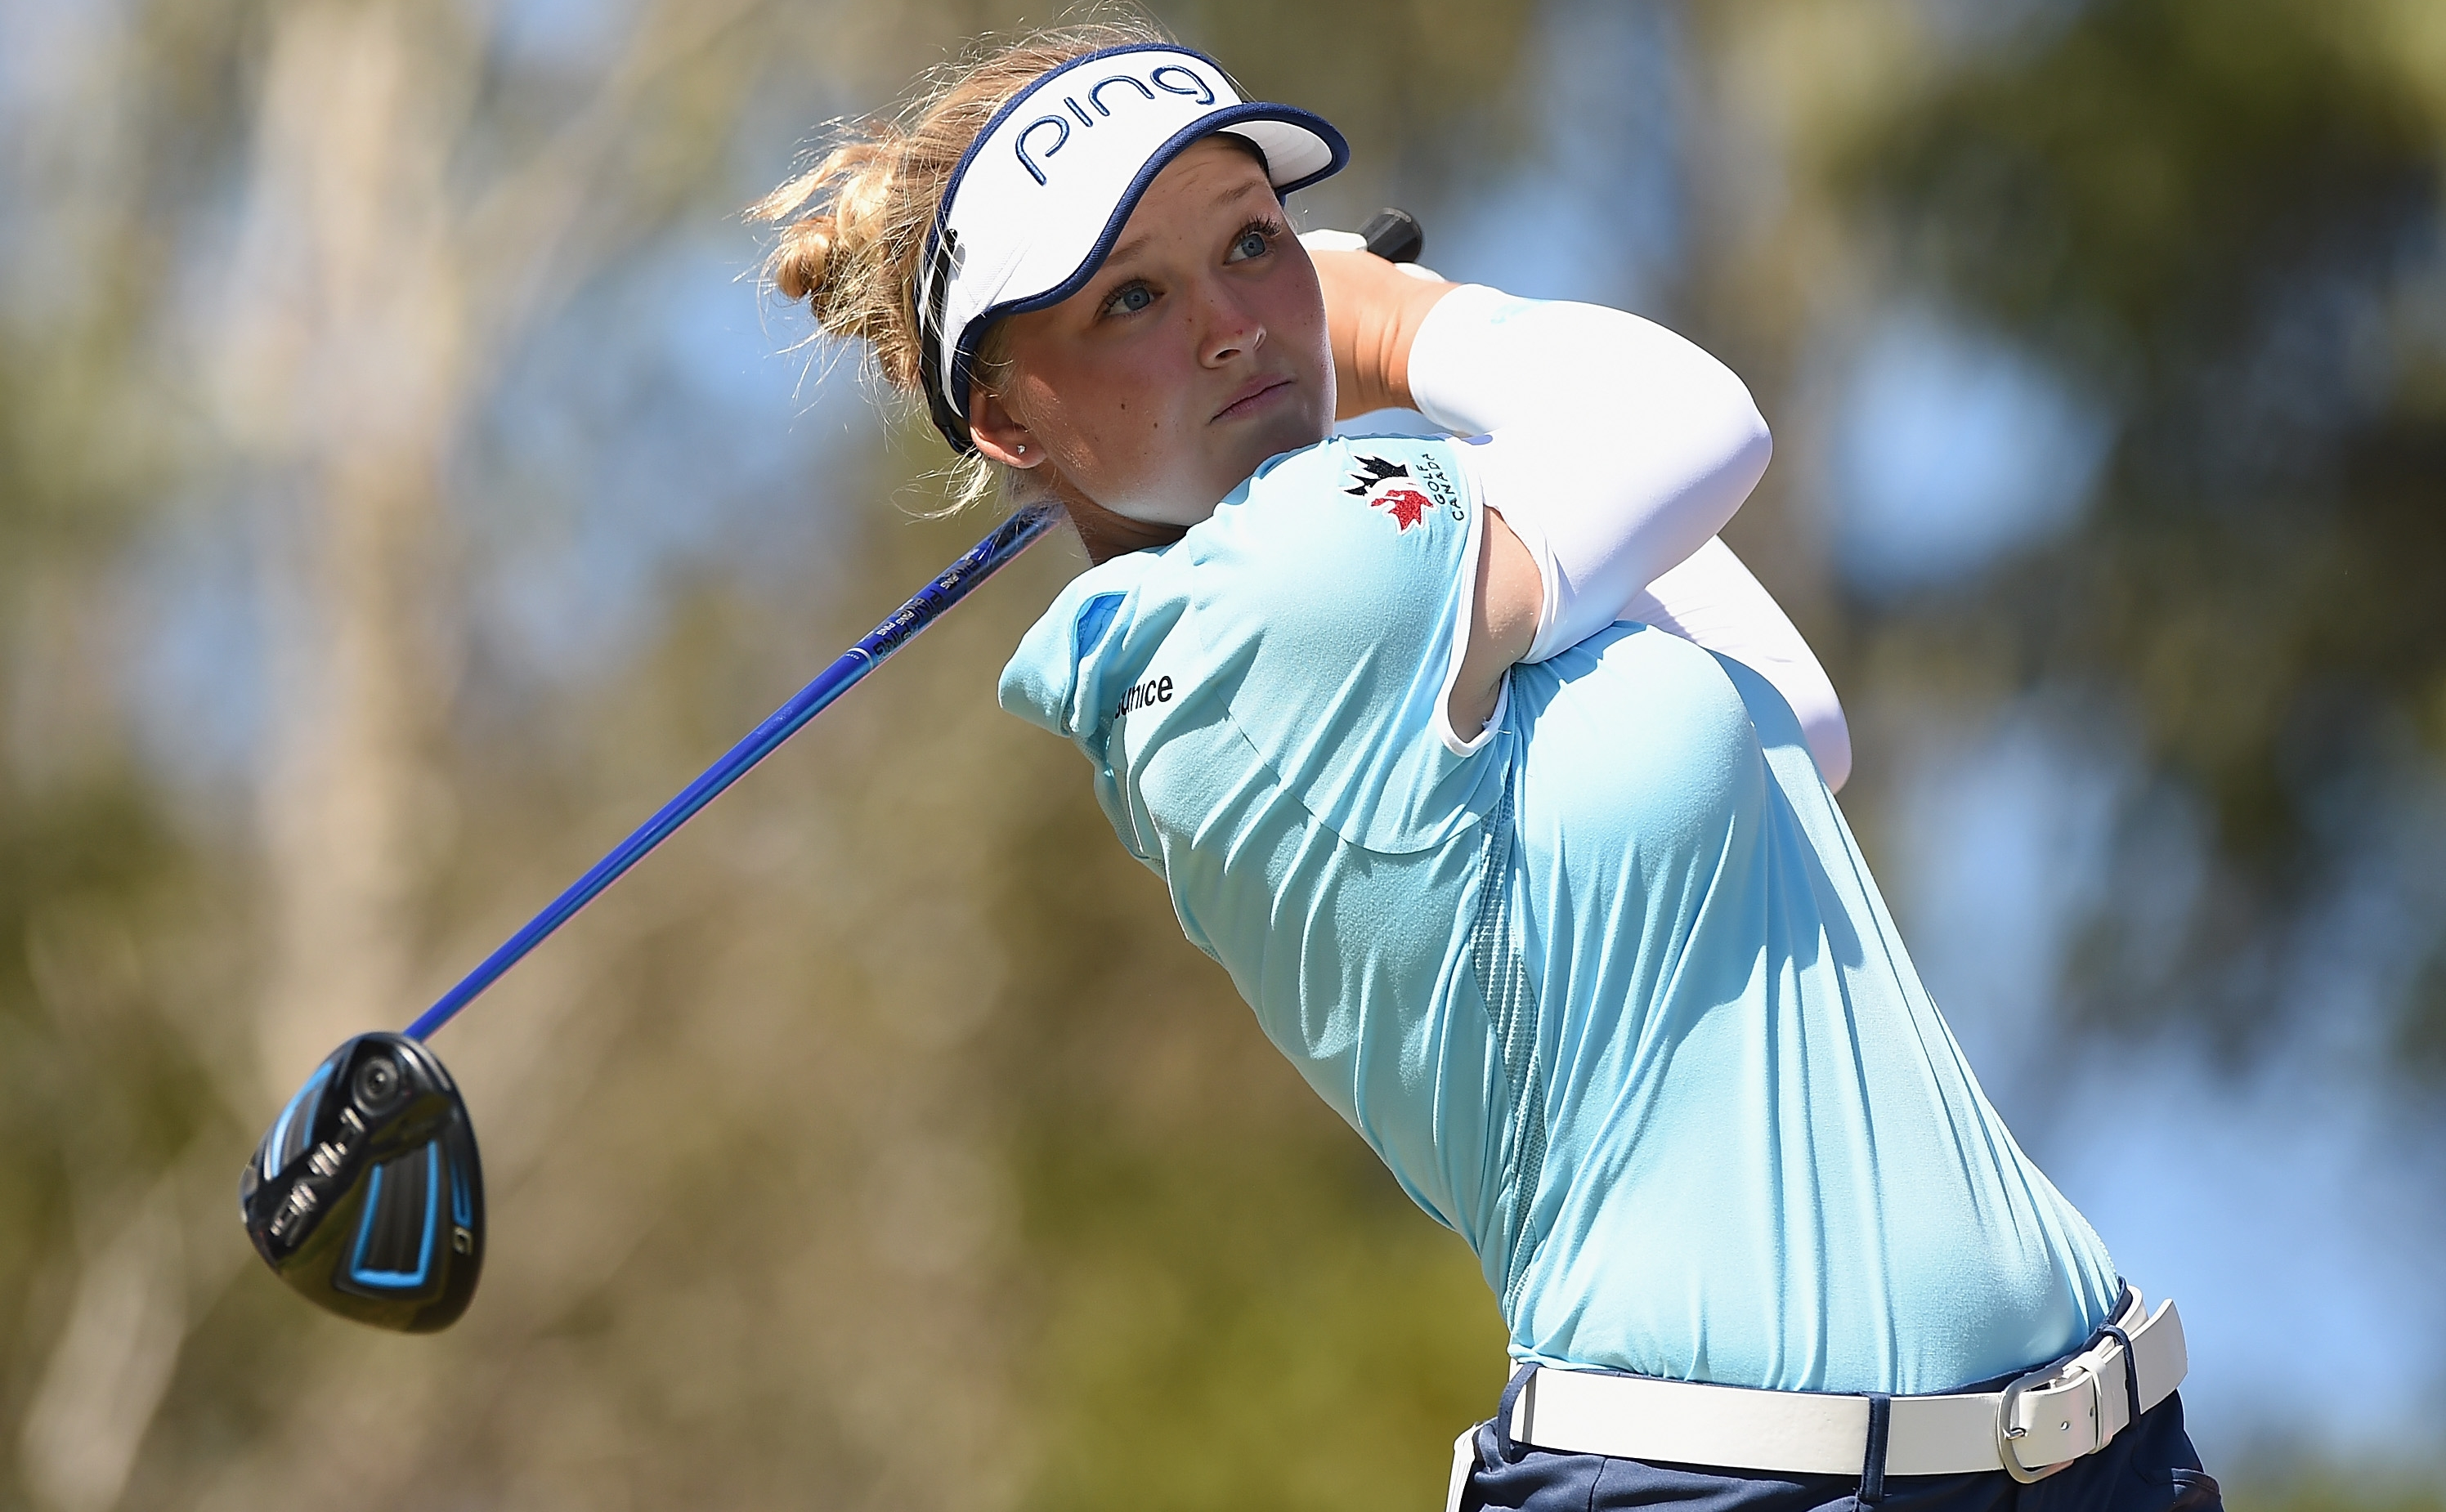 Brooke Henderson cracks top ten in Women's Rolex Rankings - Golf Canada